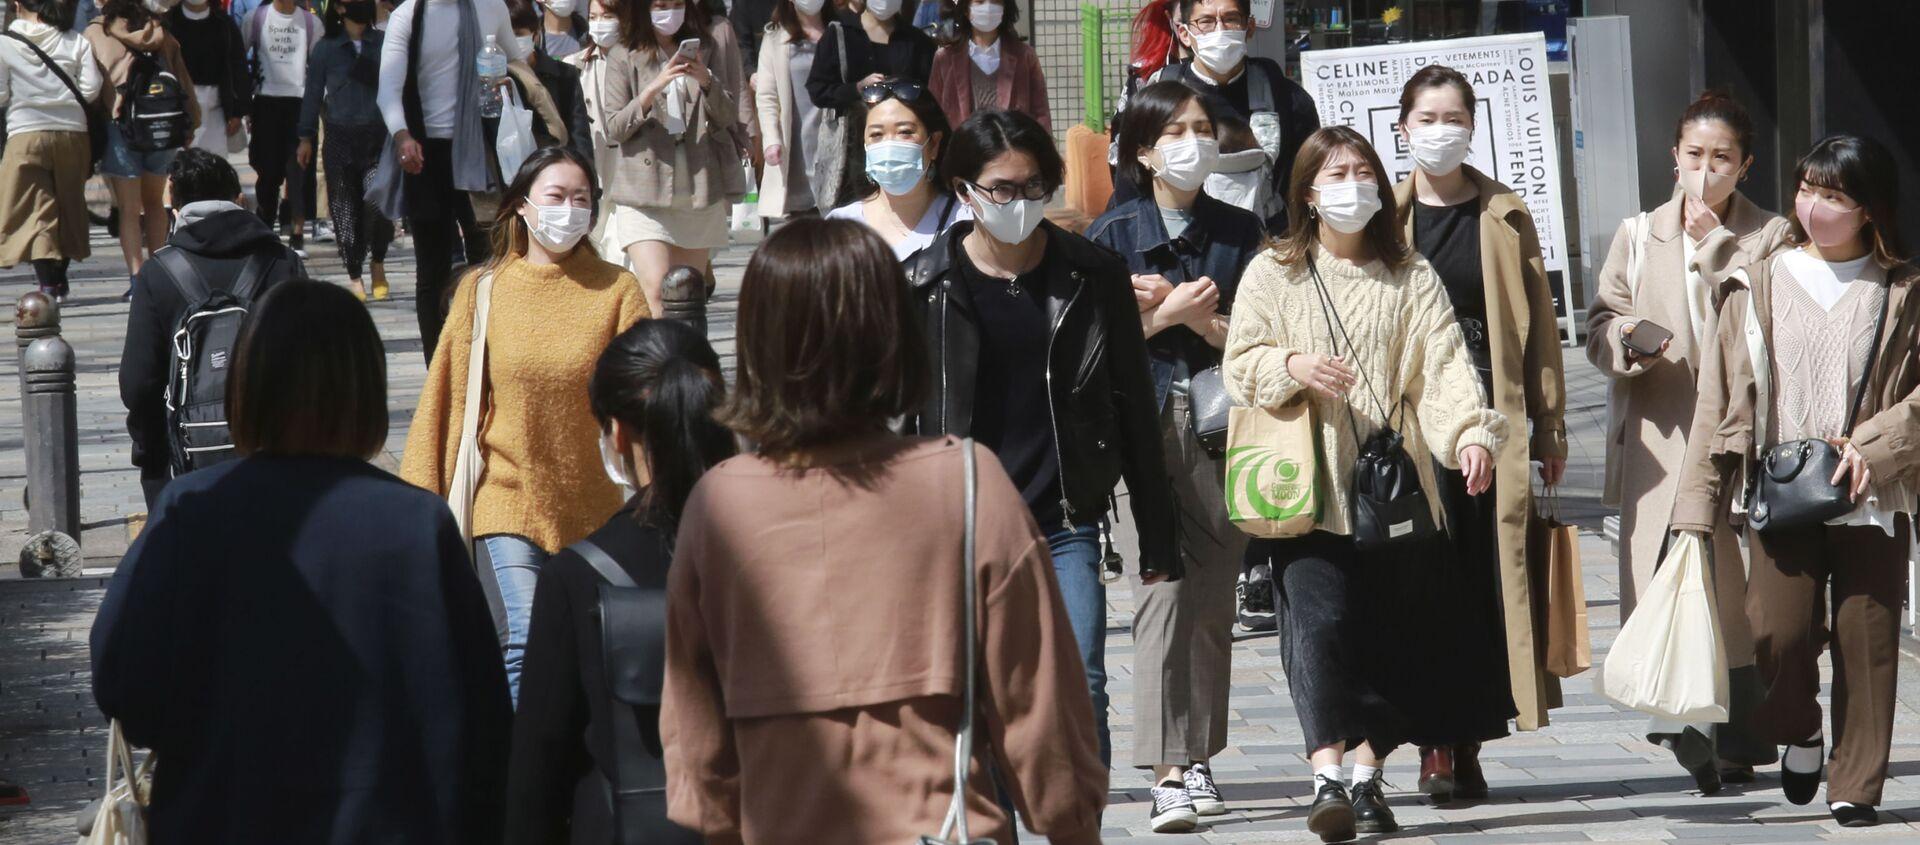 Эпидемия коронавируса COVID - жители Токио в масках - Sputnik Грузия, 1920, 22.03.2021